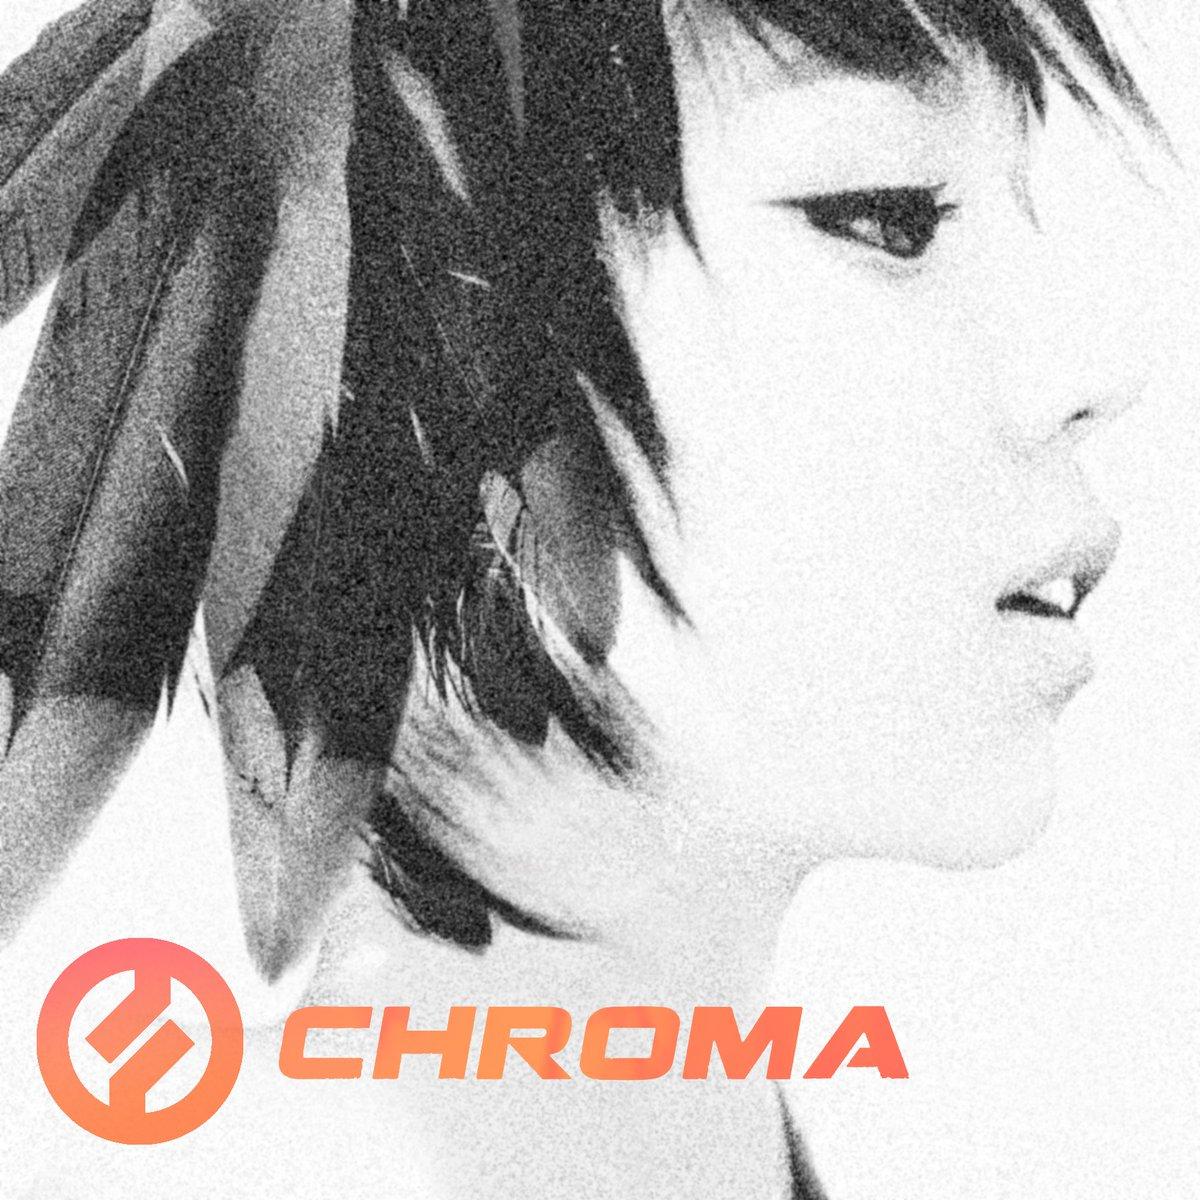 "New she Album ""Chroma"" coming soon! https://t.co/3ZiuUOMxrQ"